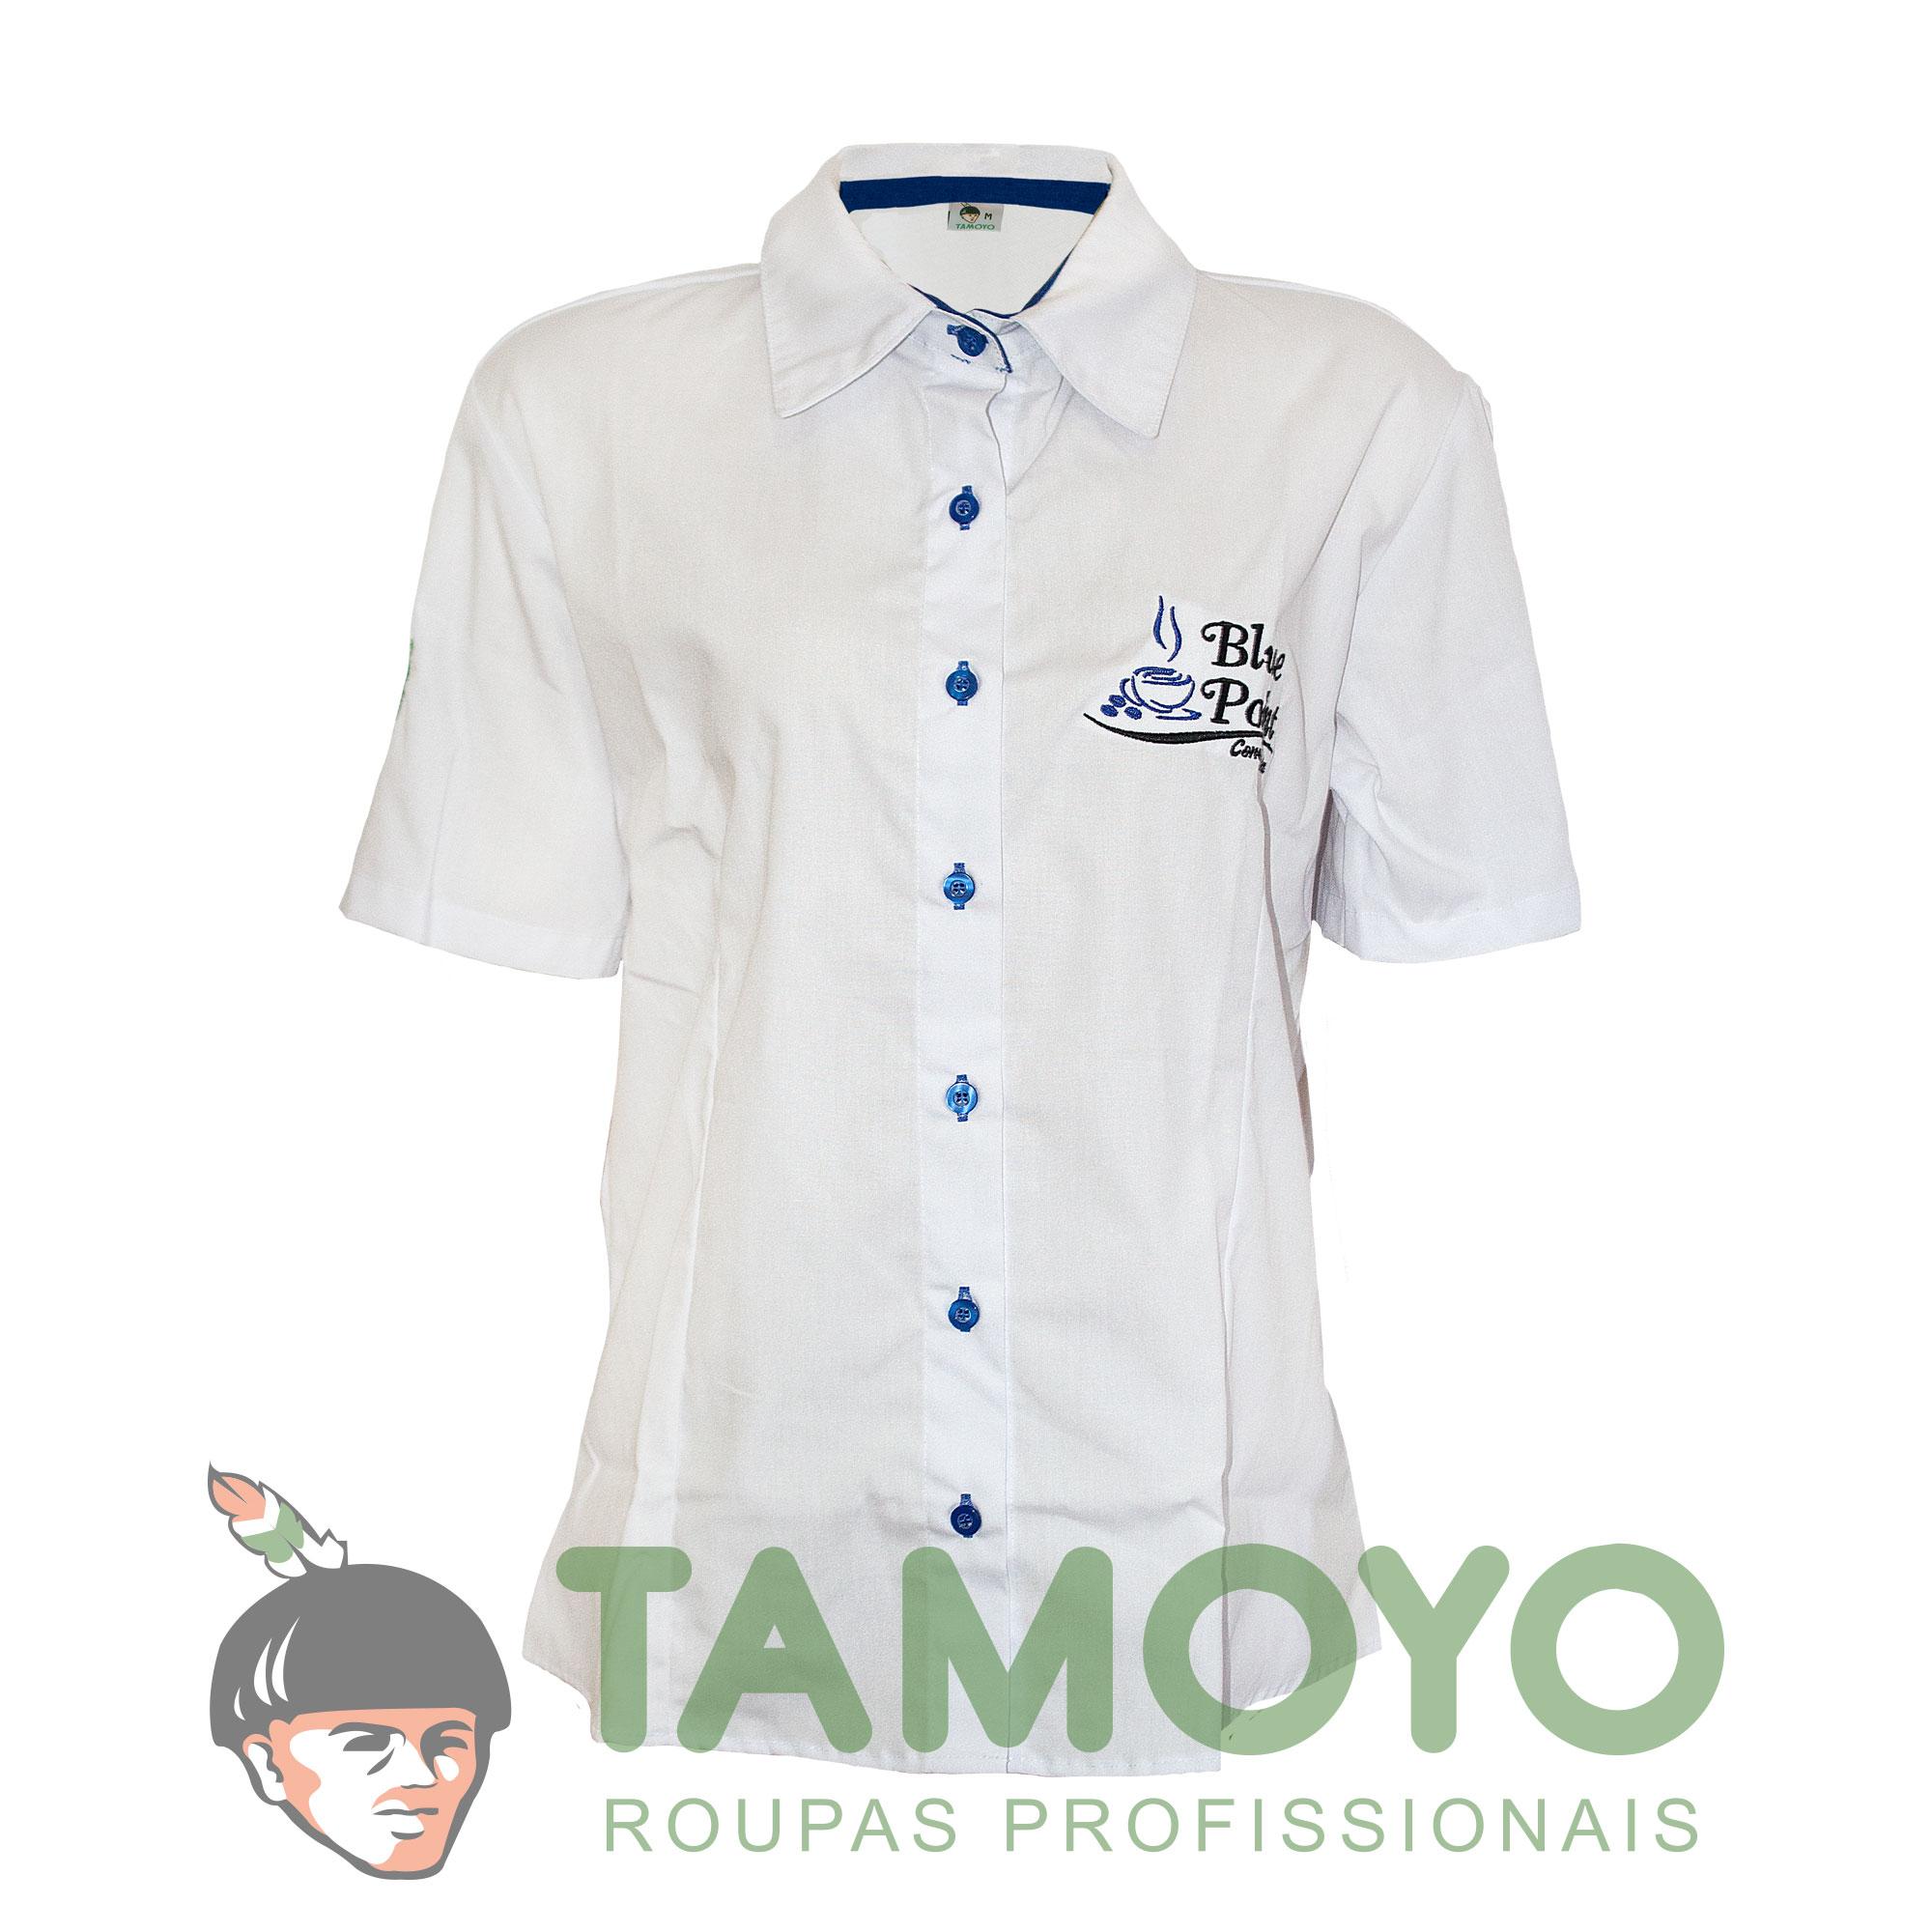 camiseta-social-feminina-roupas-tamoyo-uniformes-profissionais-f